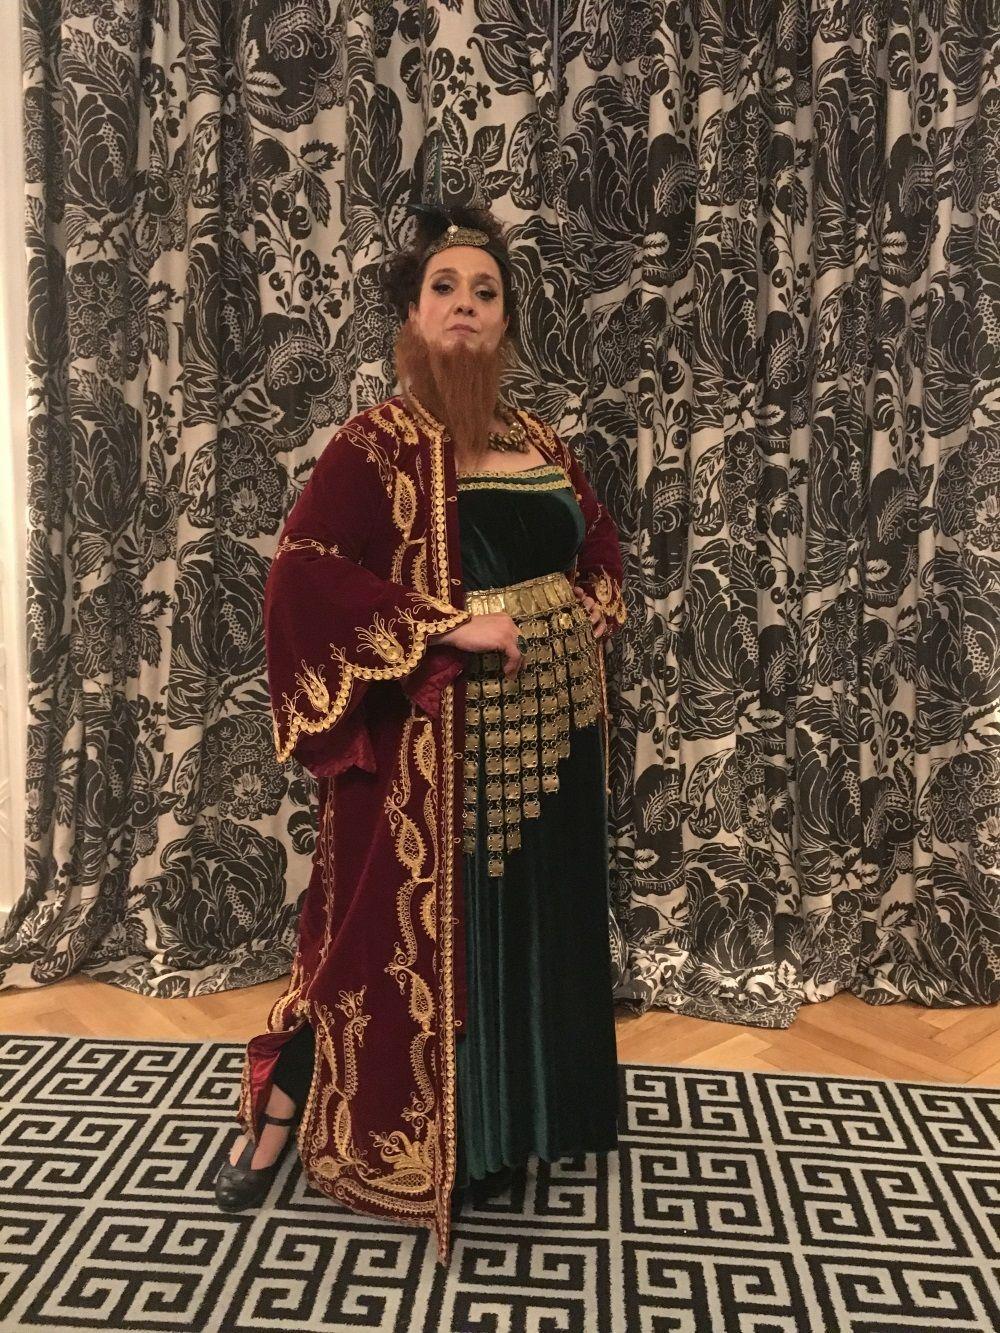 Circus performances - bearded woman